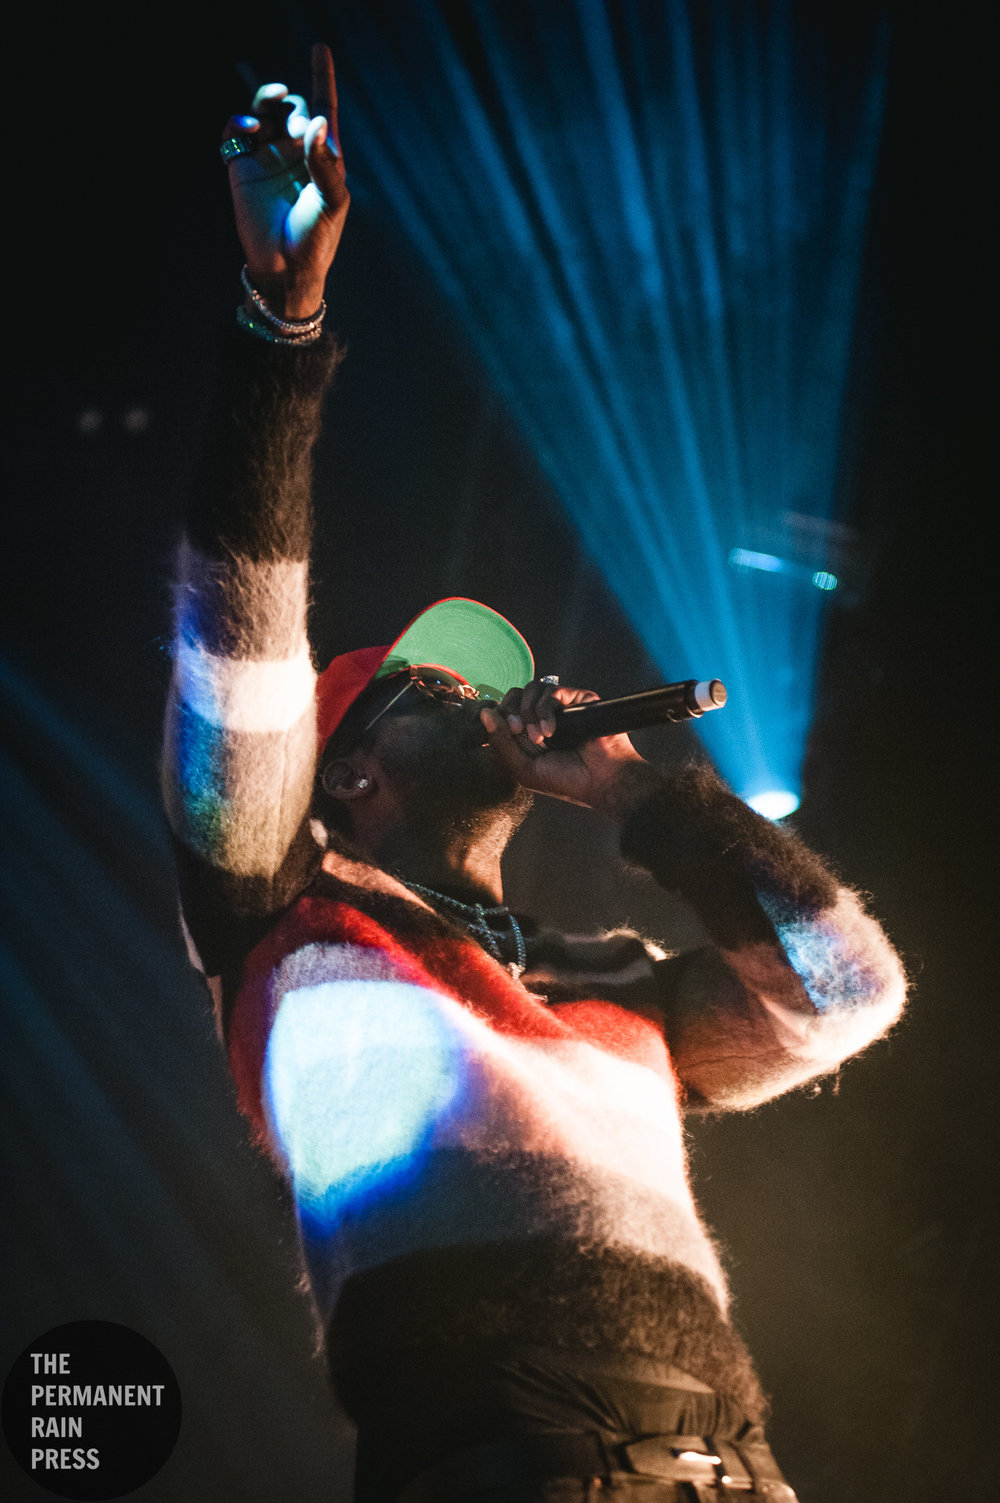 1_Gucci_Mane-Seattle-Timothy_Nguyen-20170903 (3 of 12).jpg